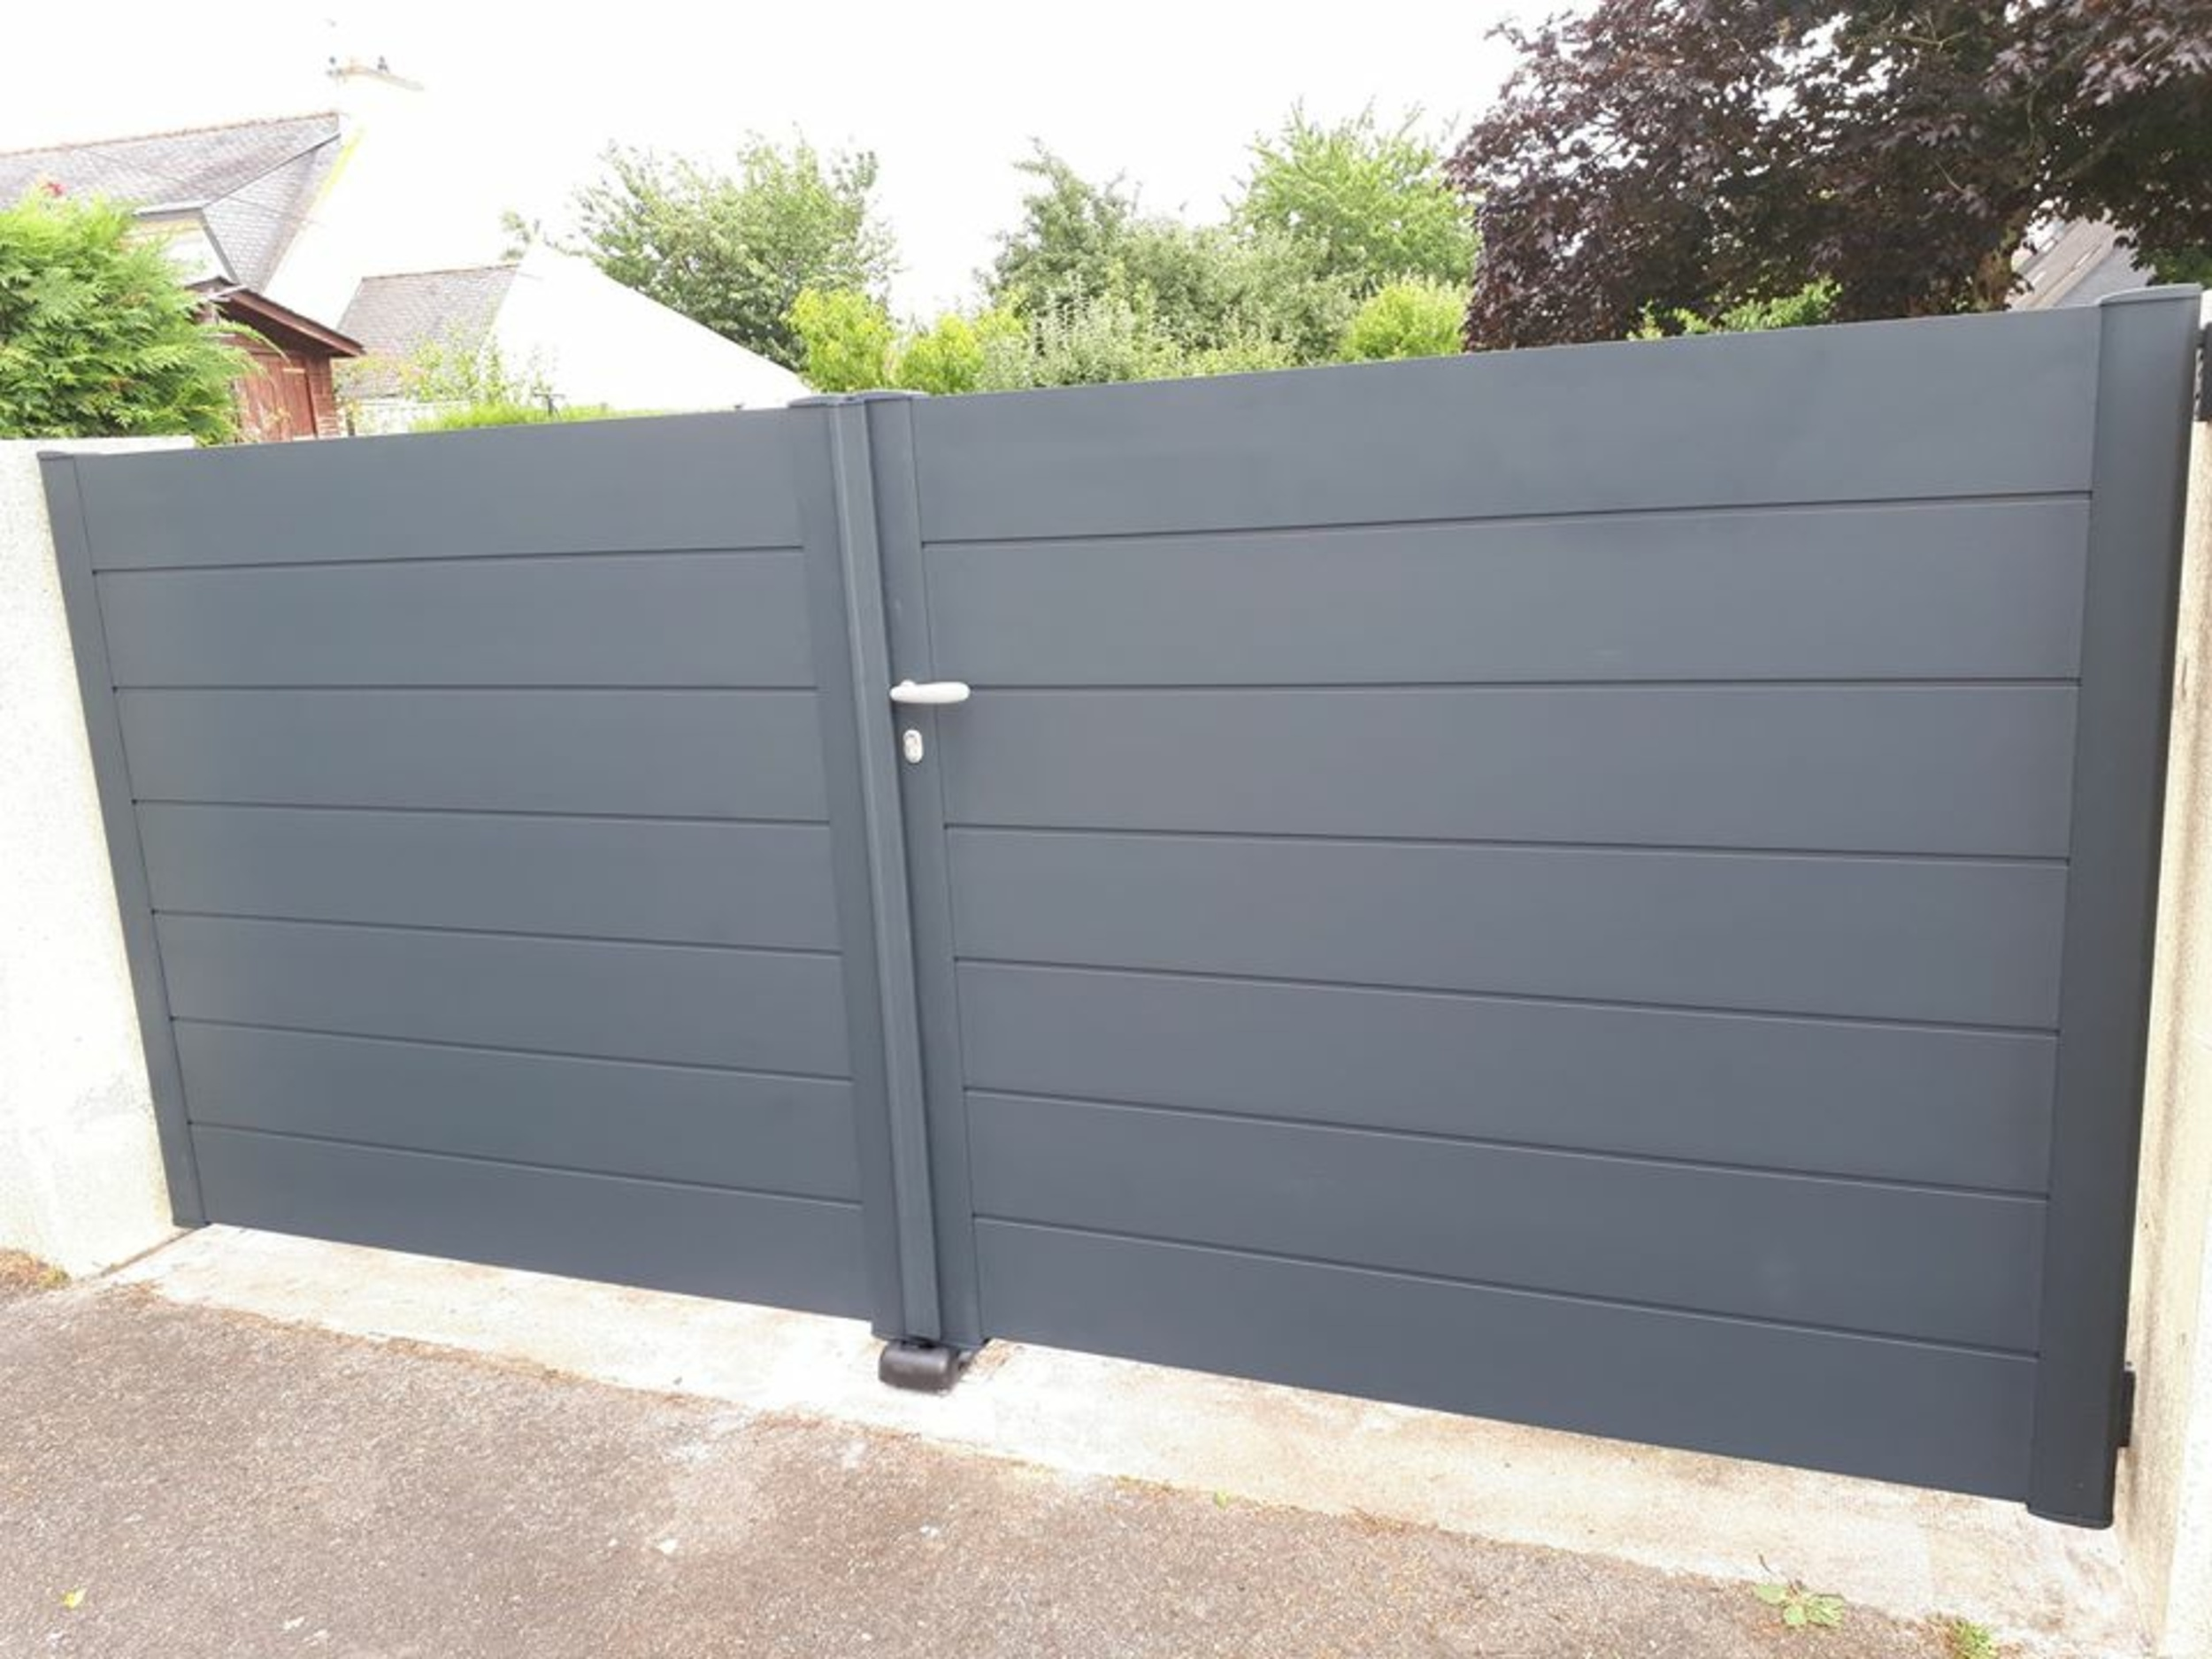 Installation d''un portail en aluminium - Hennebont (56)